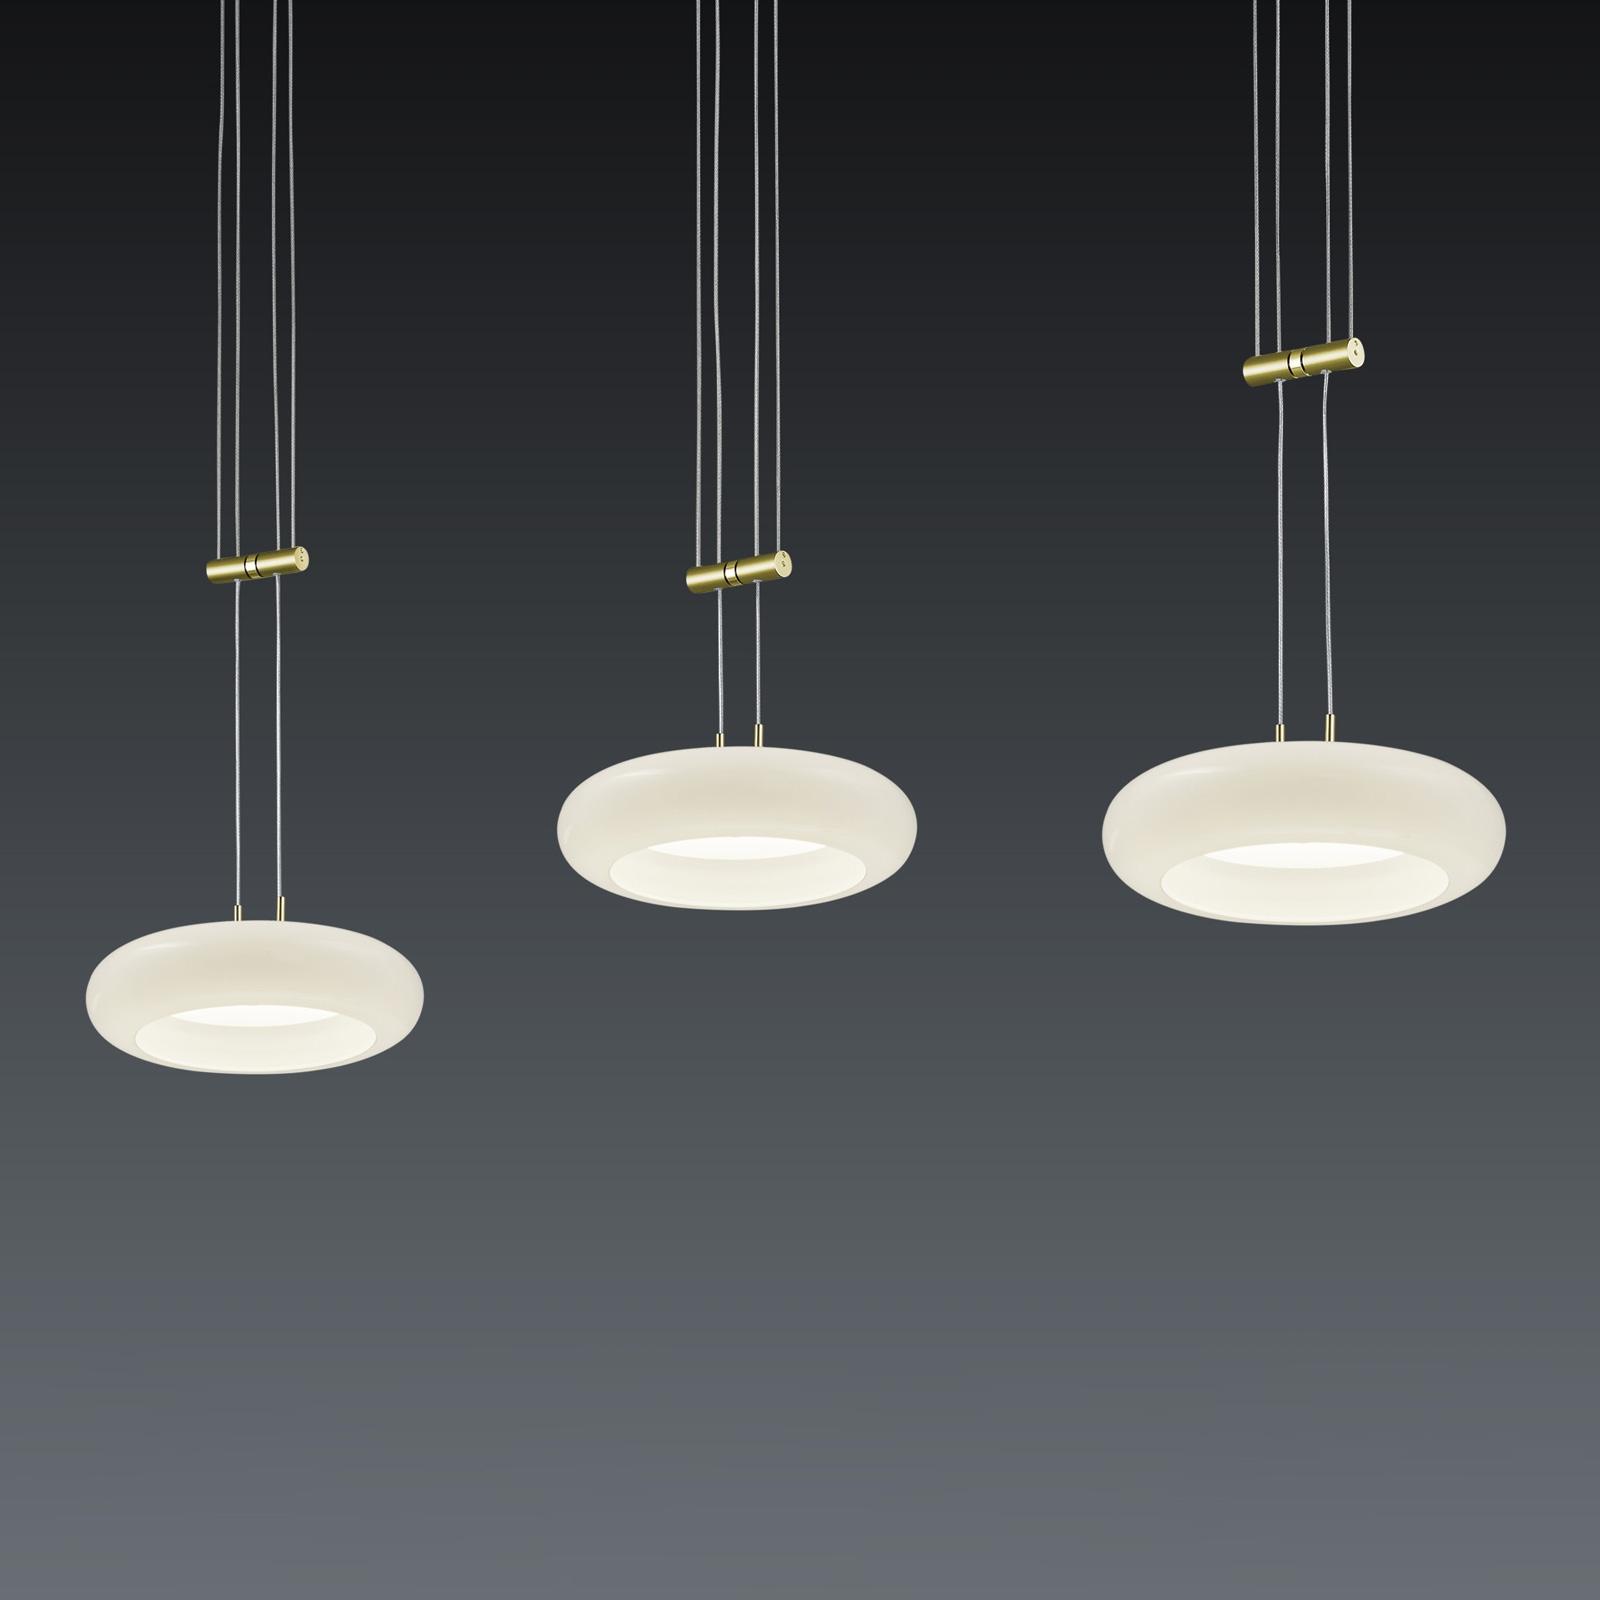 BANKAMP Centa hanglamp 3-lamps messing